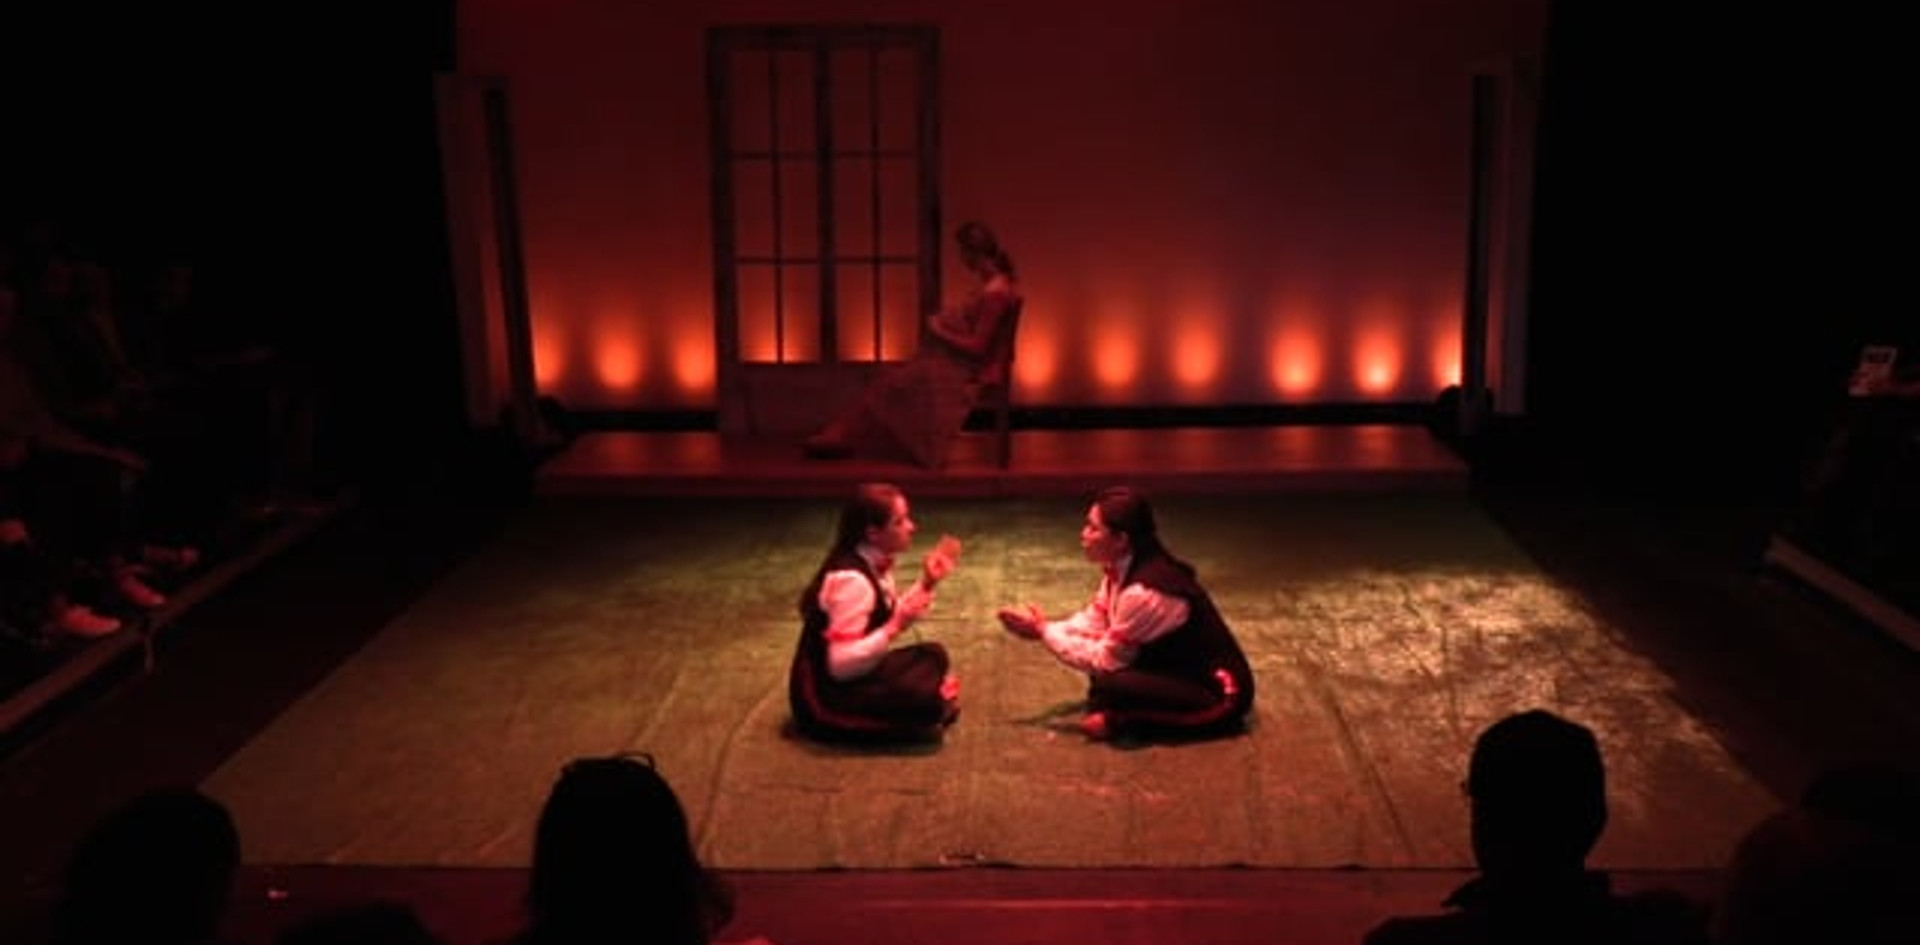 Zoë Zimin | Voice, Musical Theatre, Acting Reel